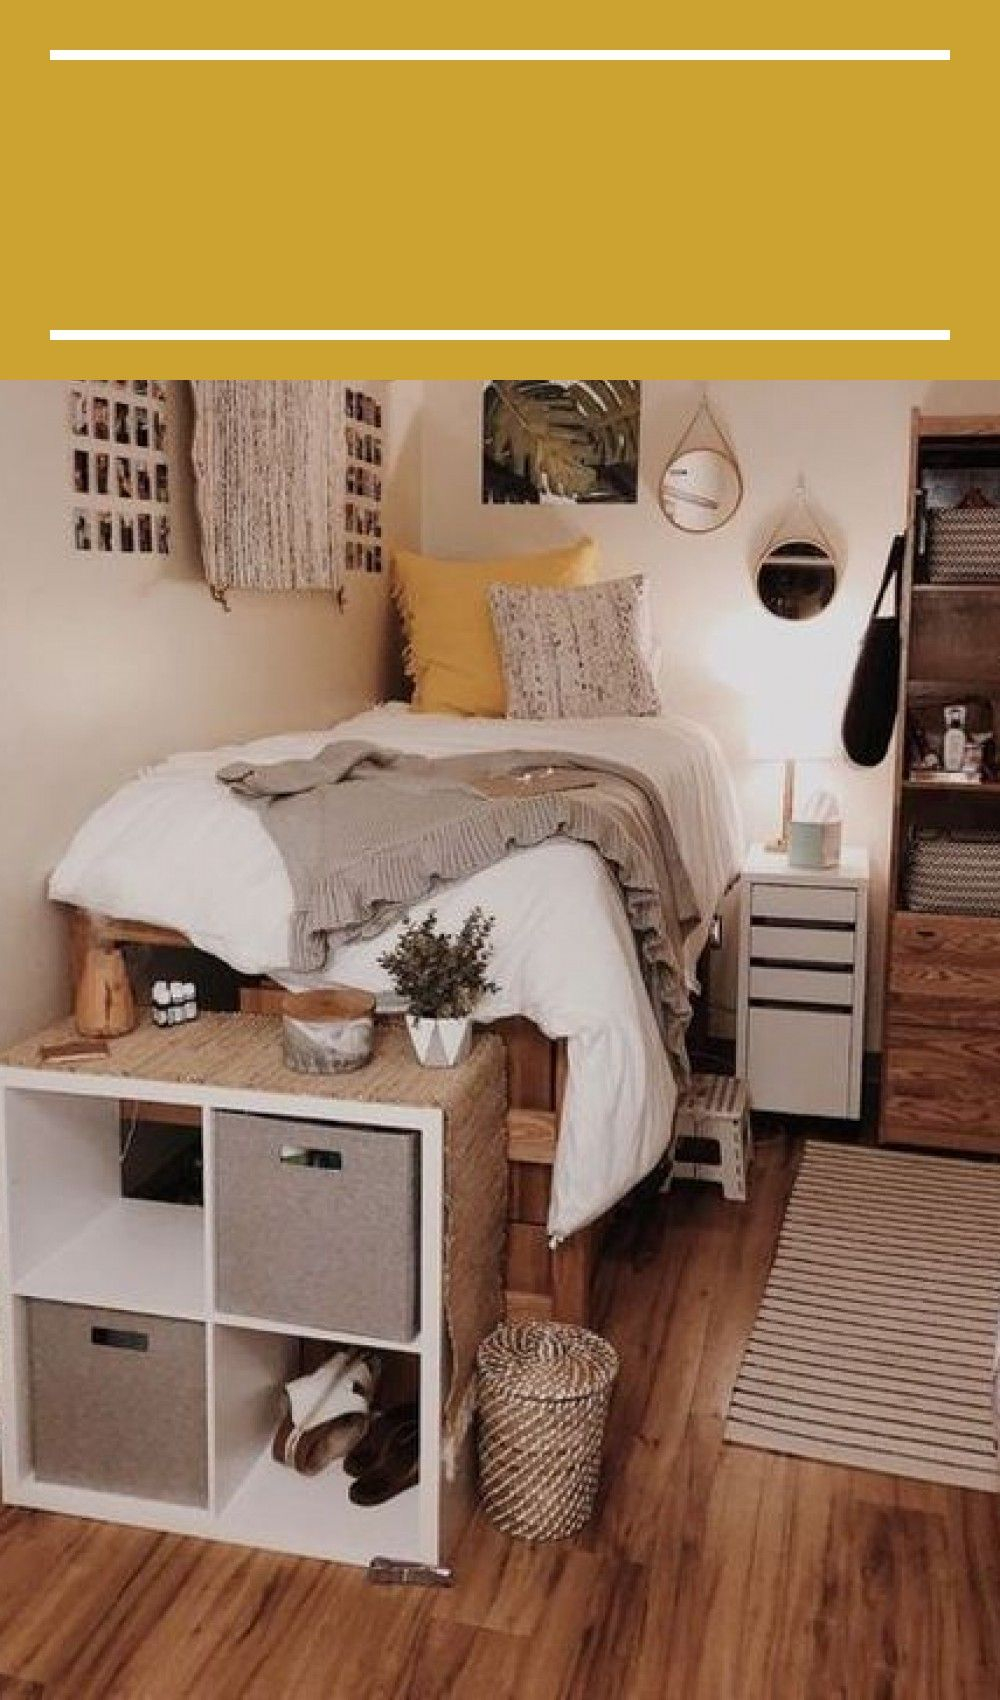 Dorm Room Furniture: #dorm Room Organization Furniture 42 Brilliant Dorm Room